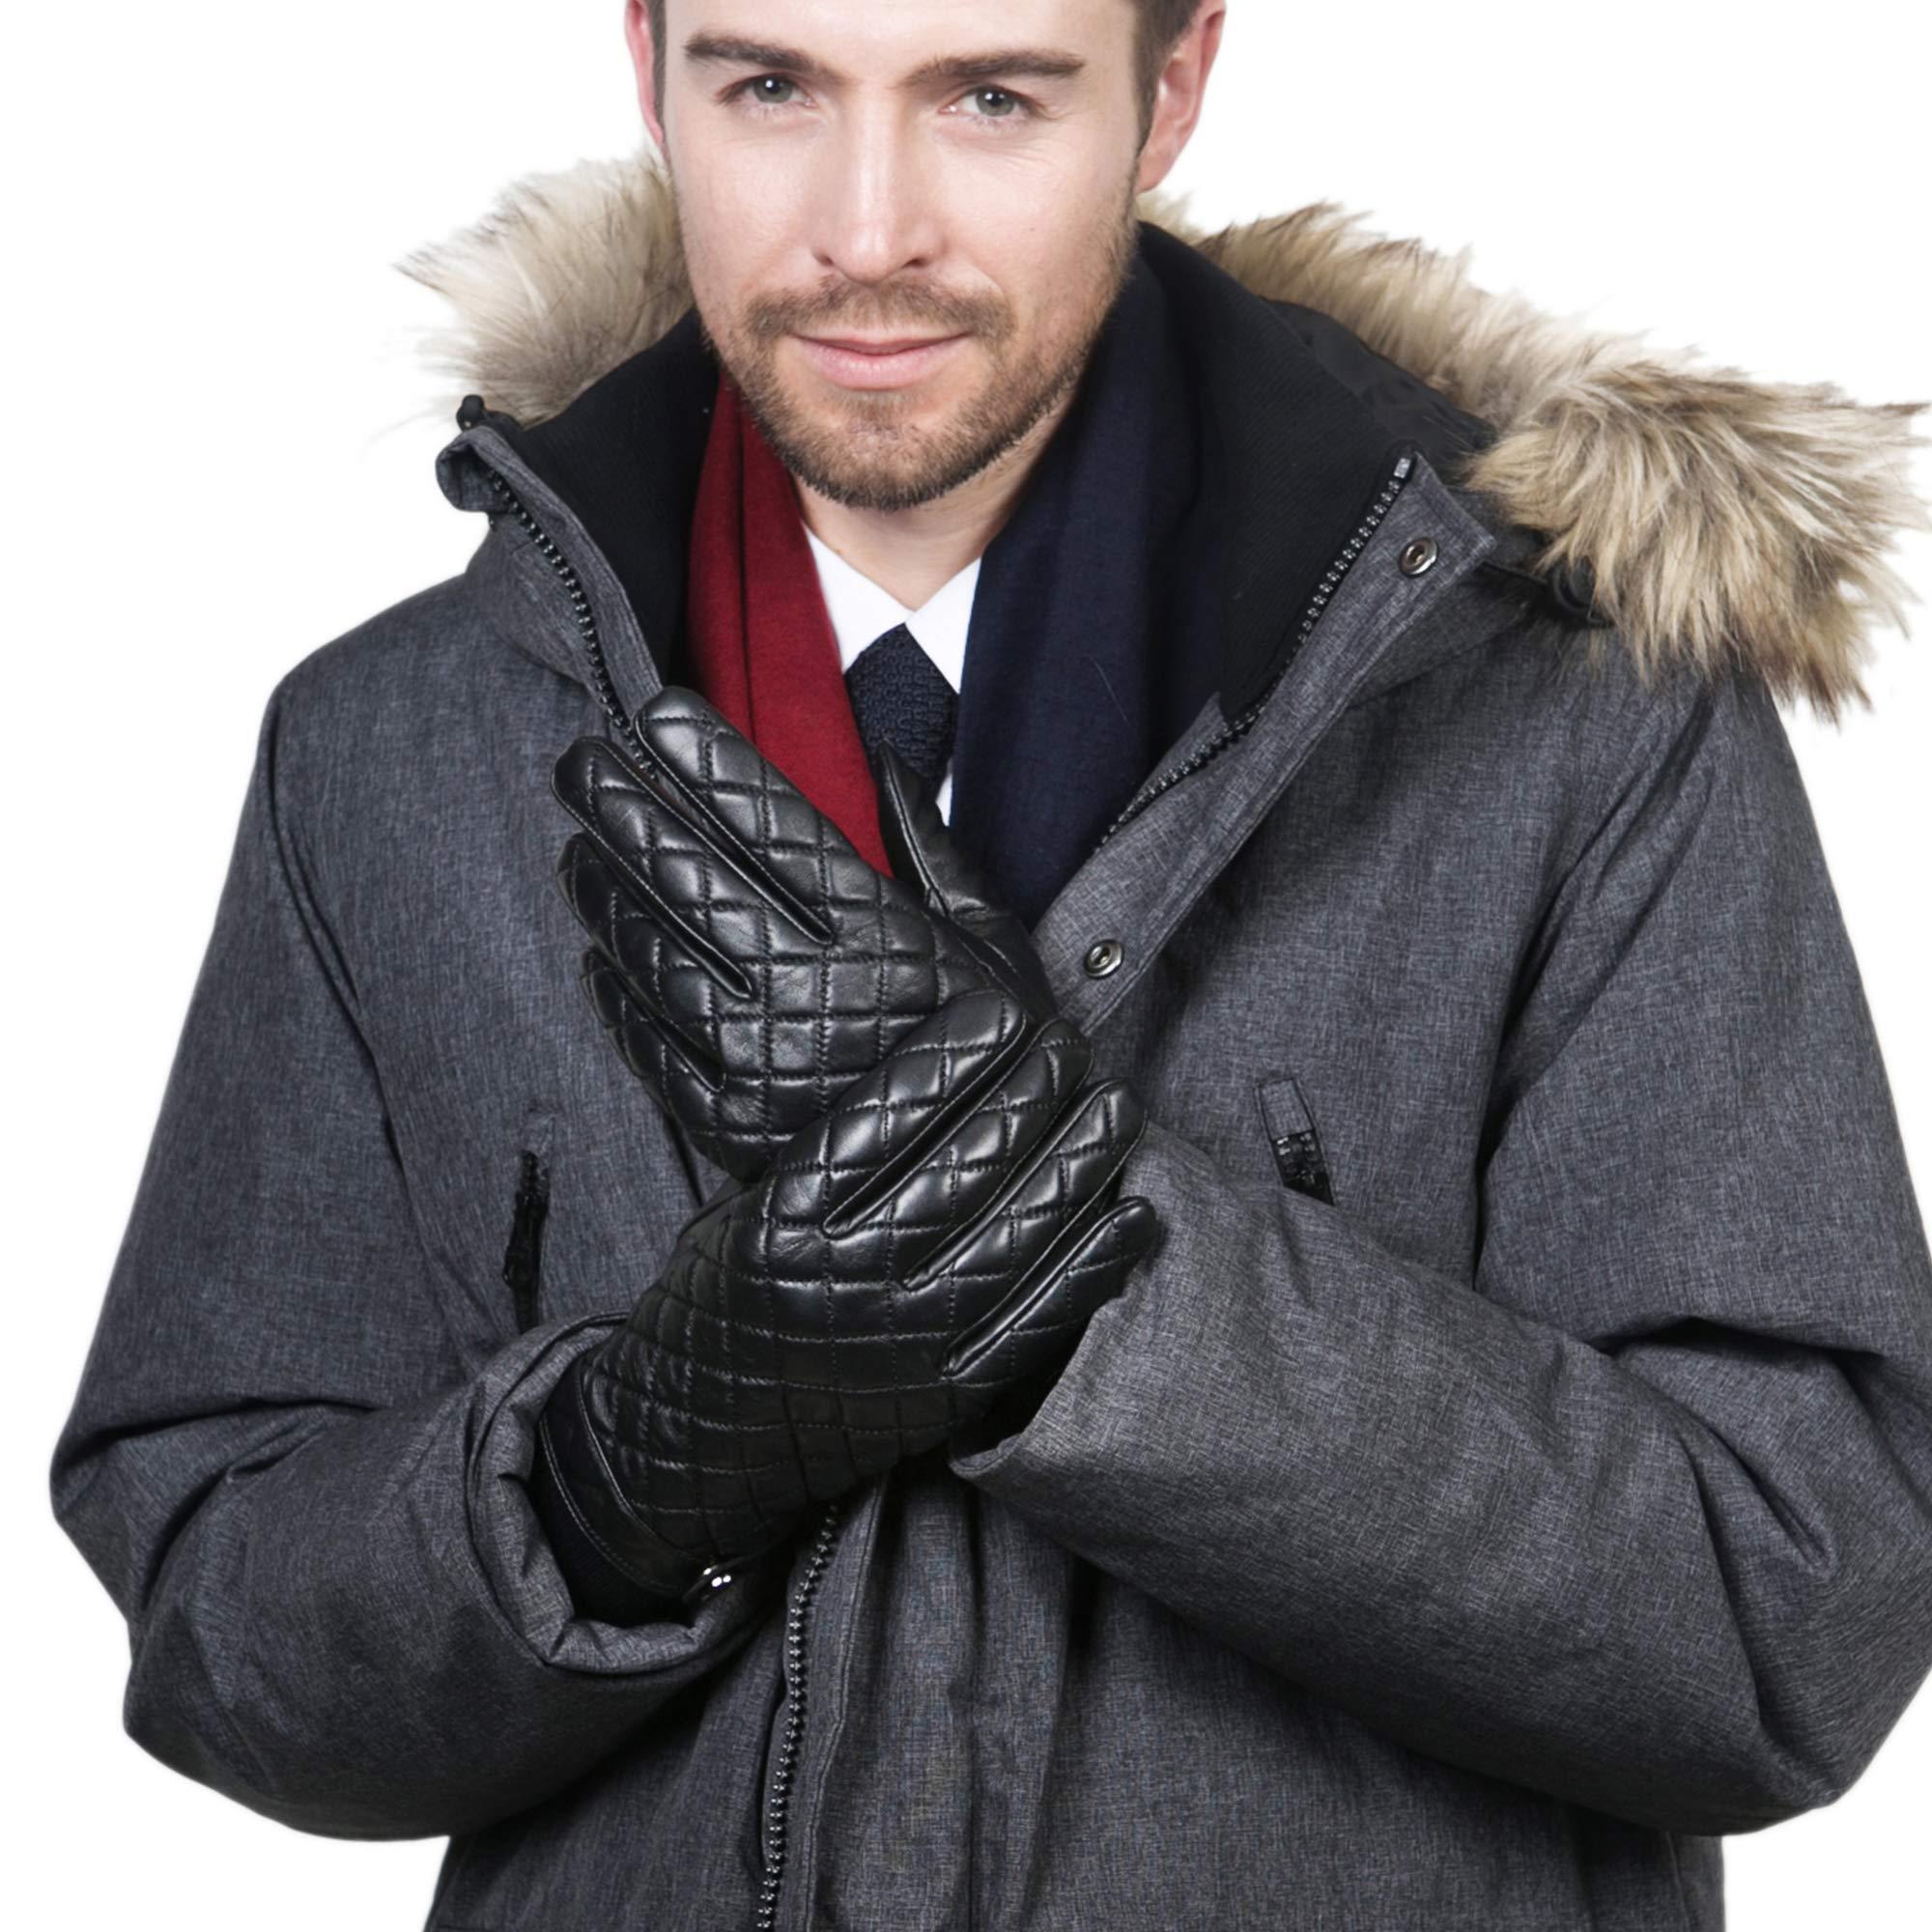 YISEVEN Men's Goatskin Winter Gloves, Fashion Lattice Style, Touchscreen Technology,Black,8.5''